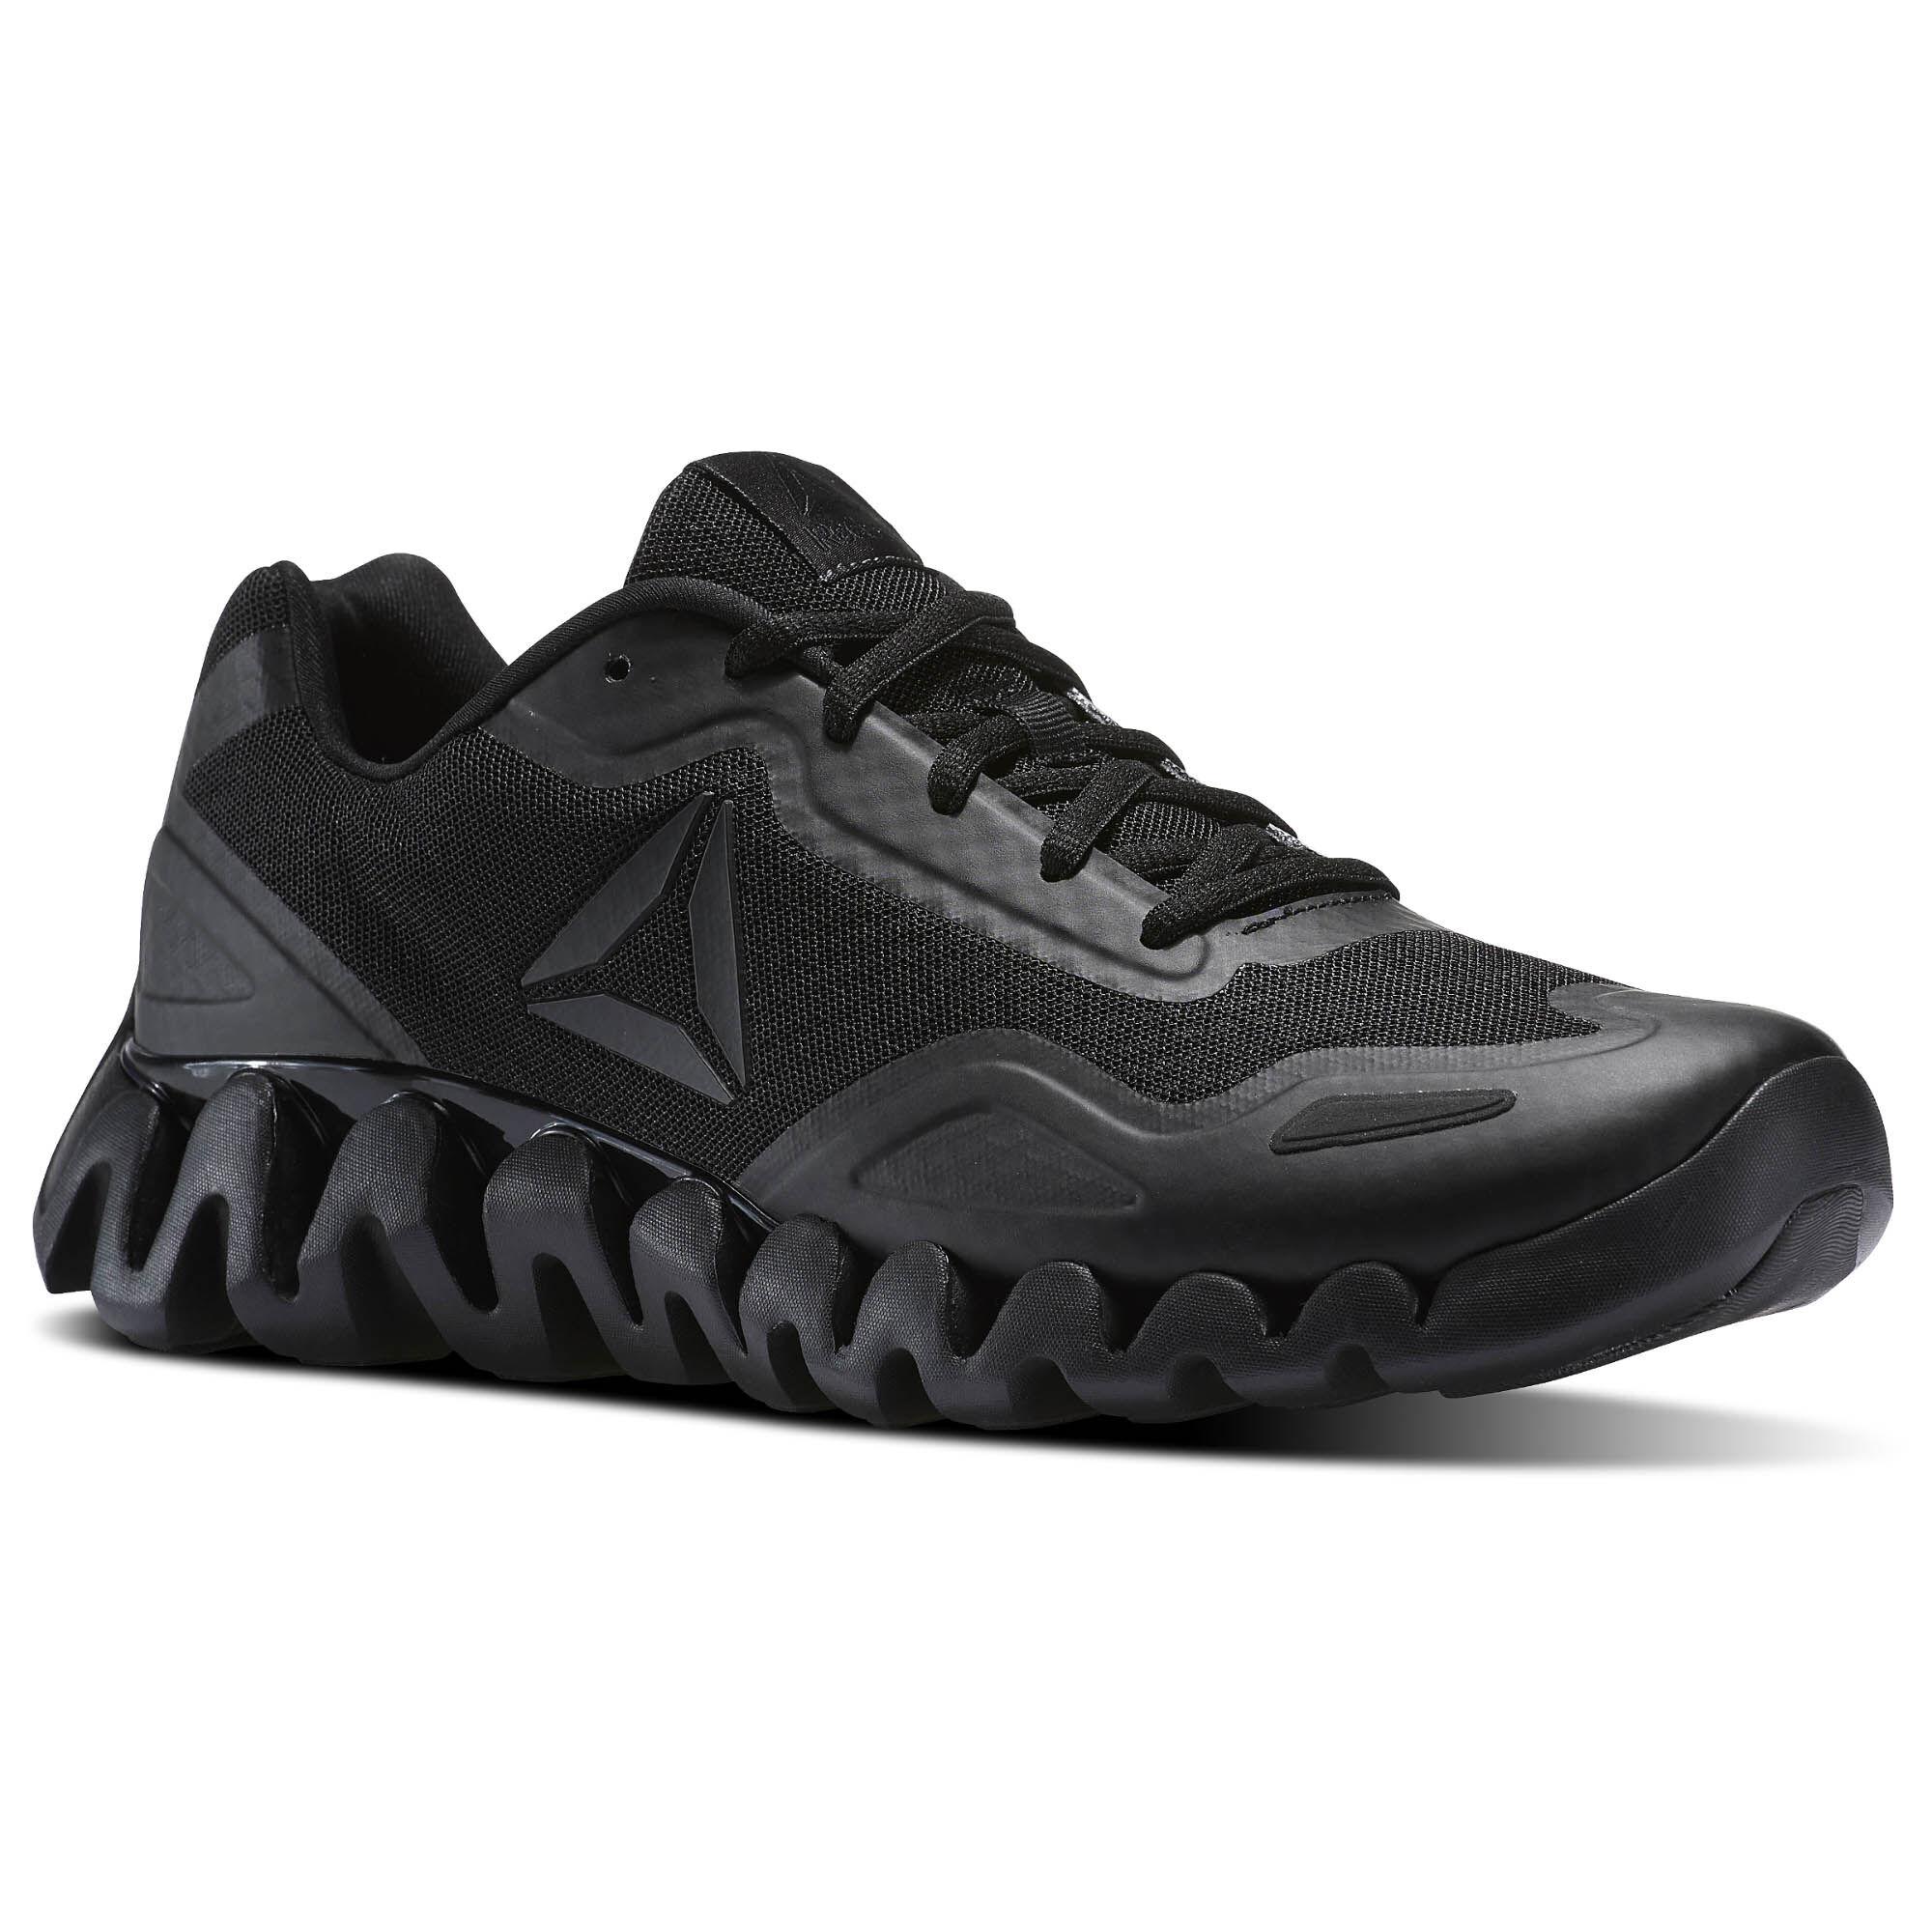 39fae64d8cfc reebok zig shoes - Ecosia